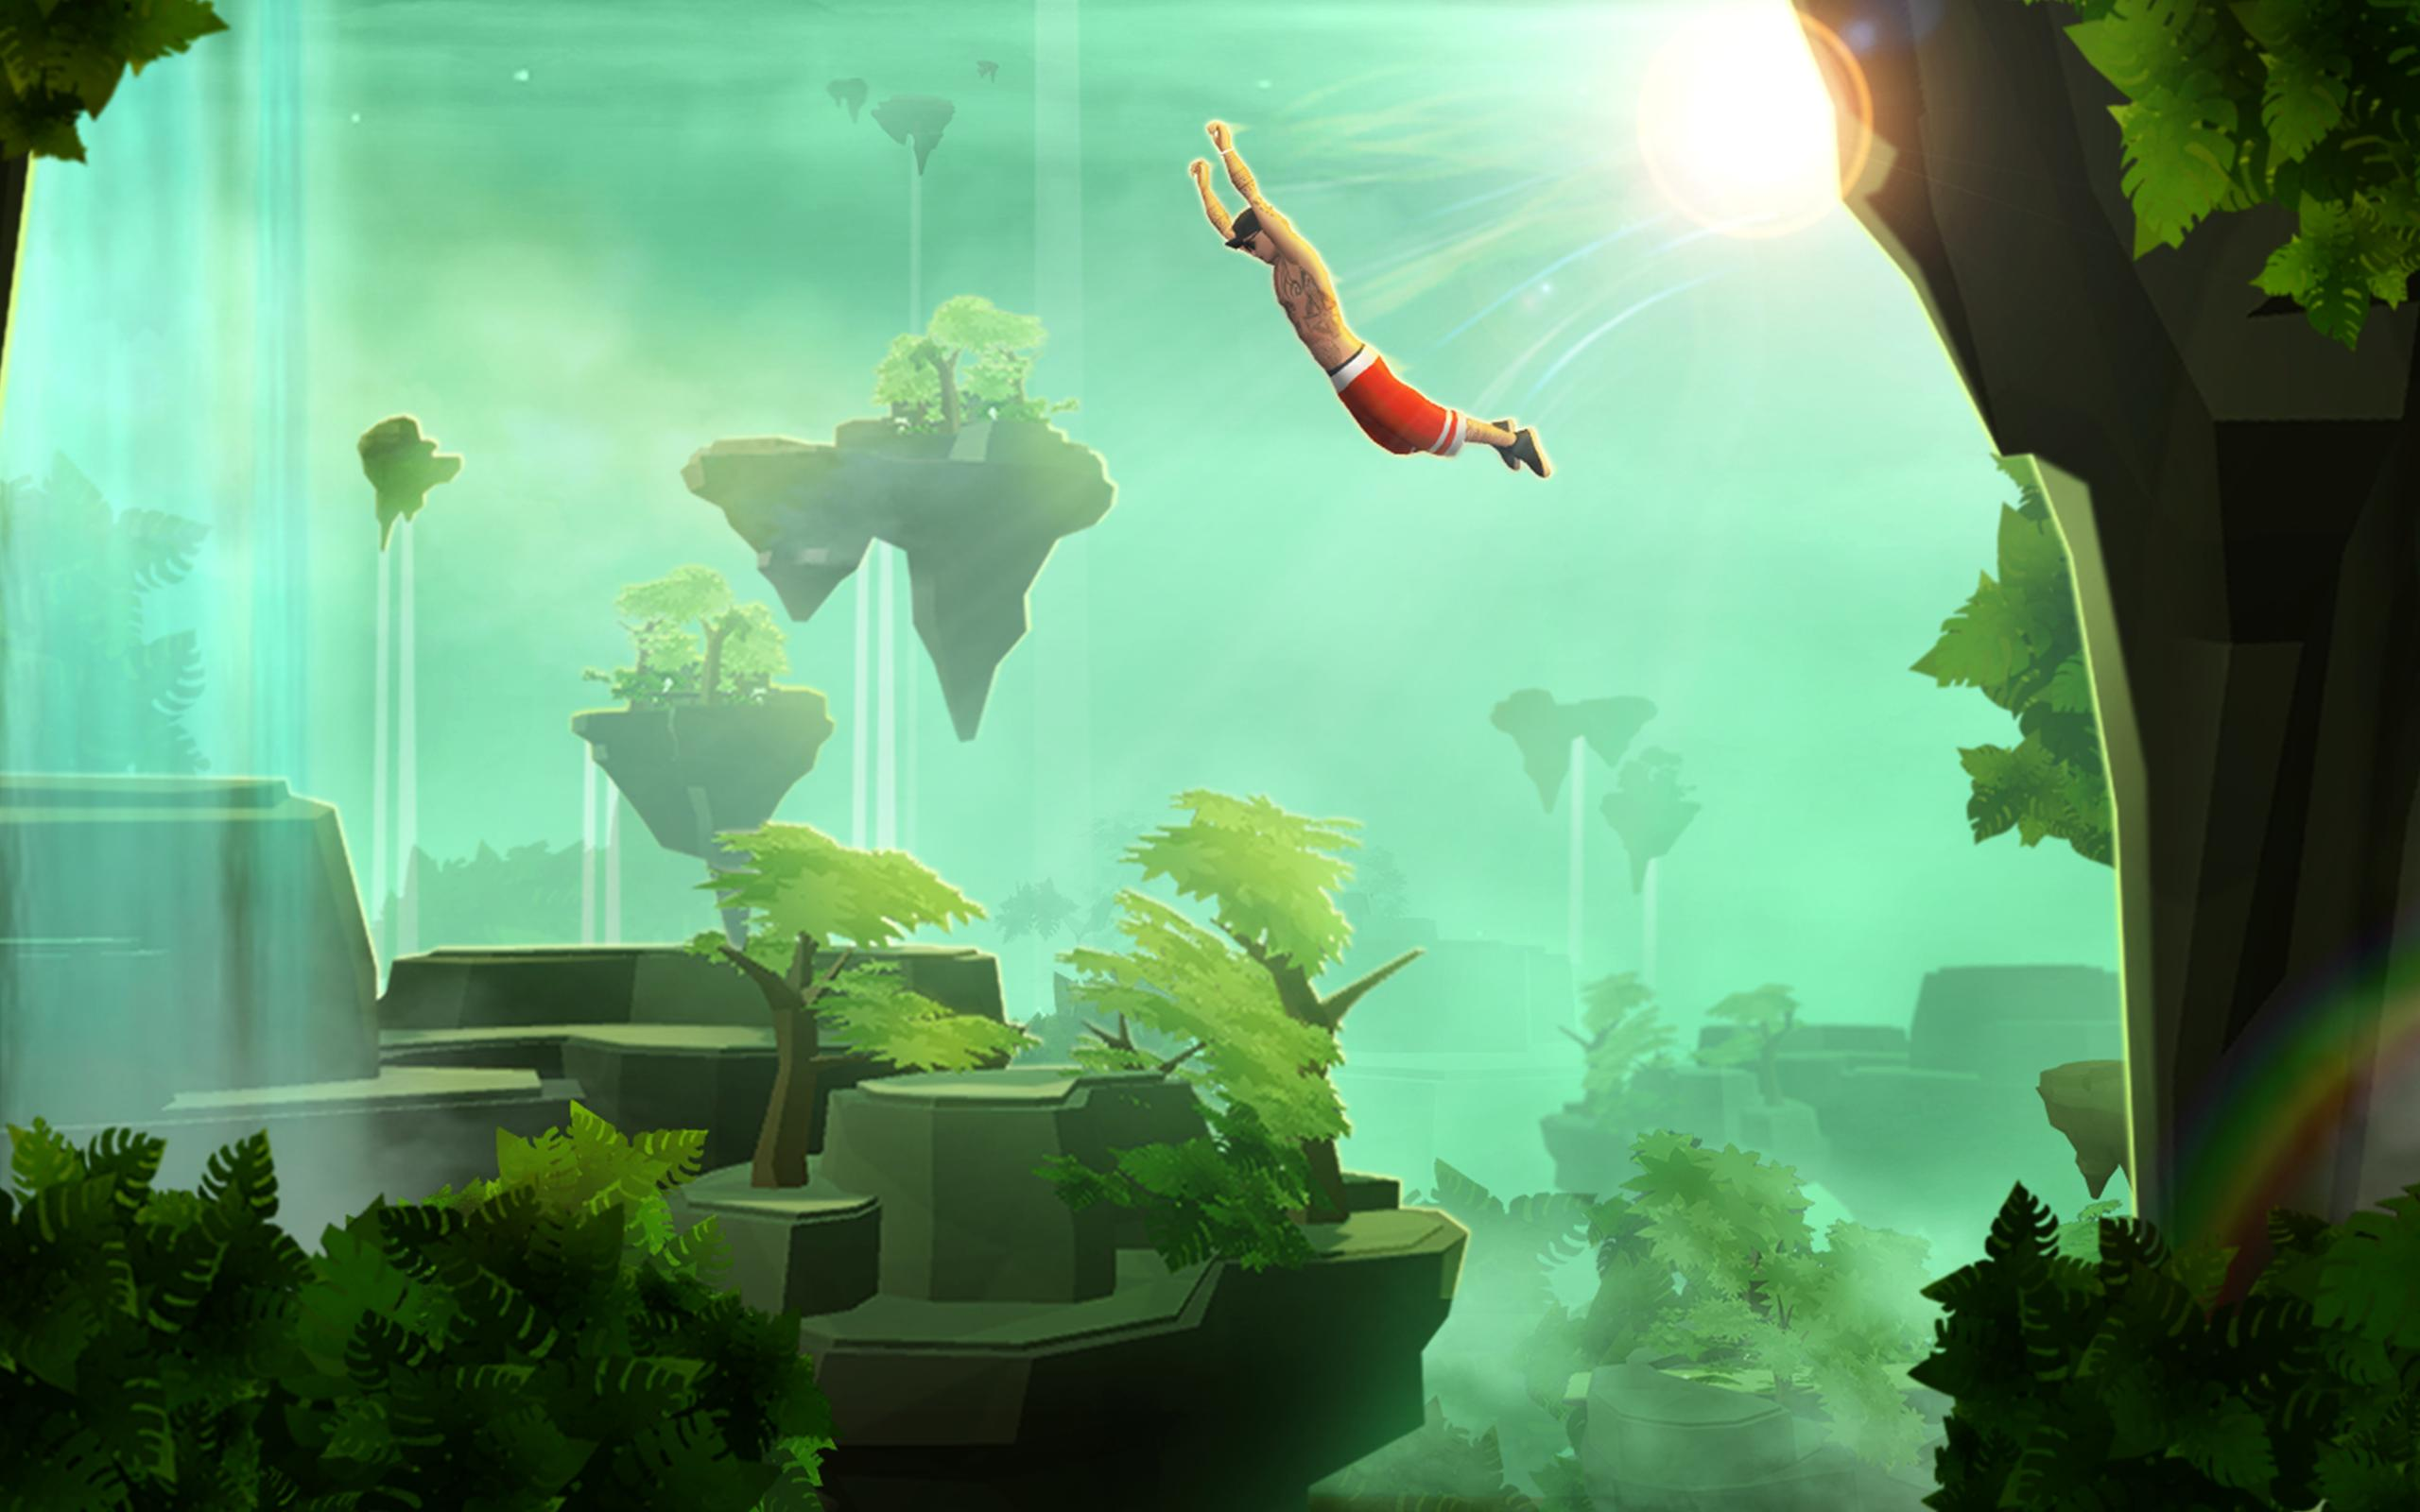 Sky Dancer Run - Running Game 4.2.0 Screenshot 10